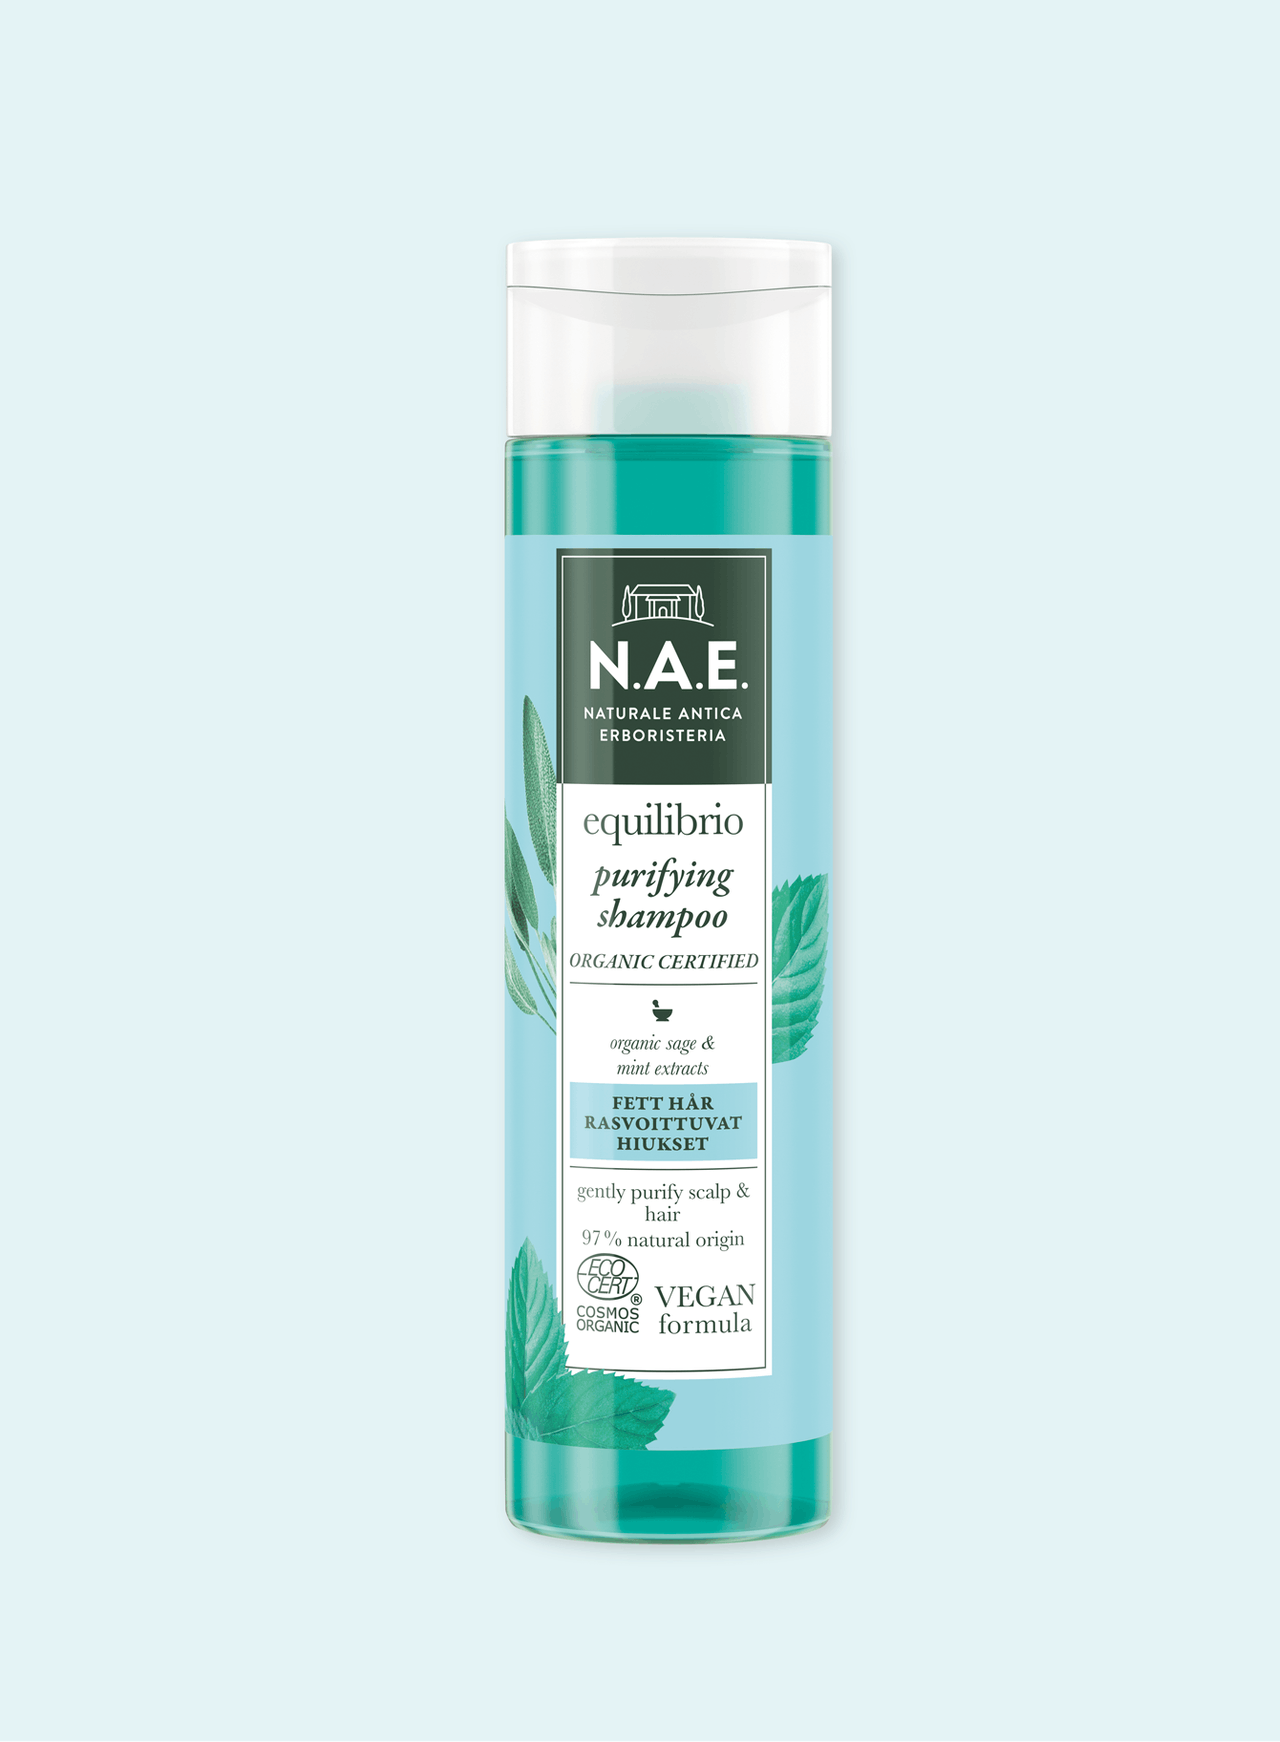 Puhdistava shampoo